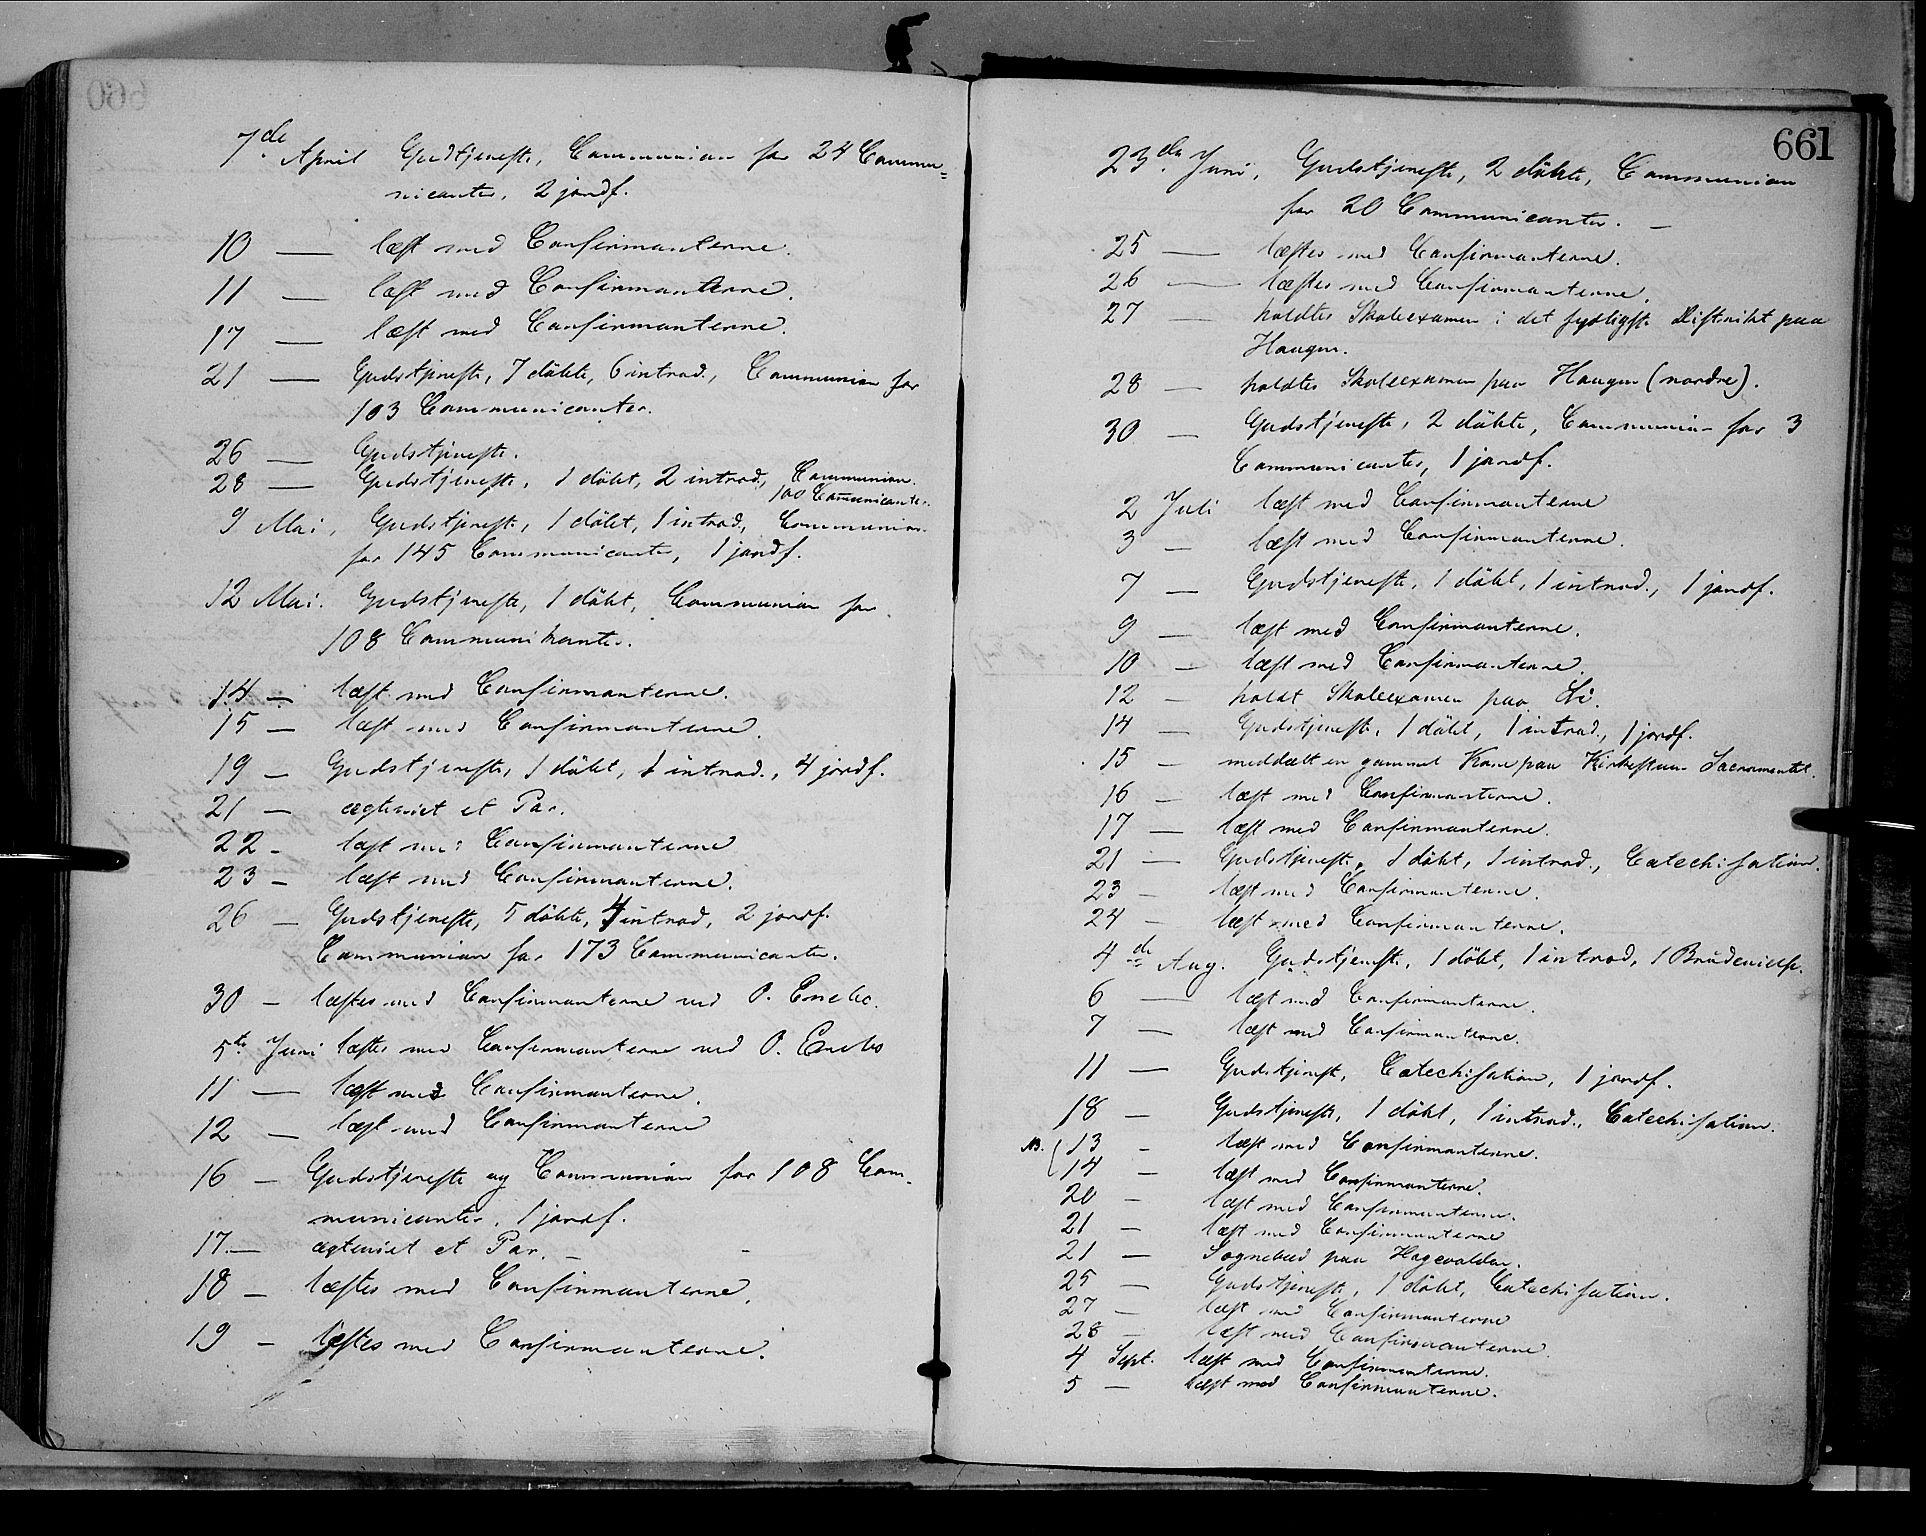 SAH, Dovre prestekontor, Parish register (official) no. 1, 1854-1878, p. 661